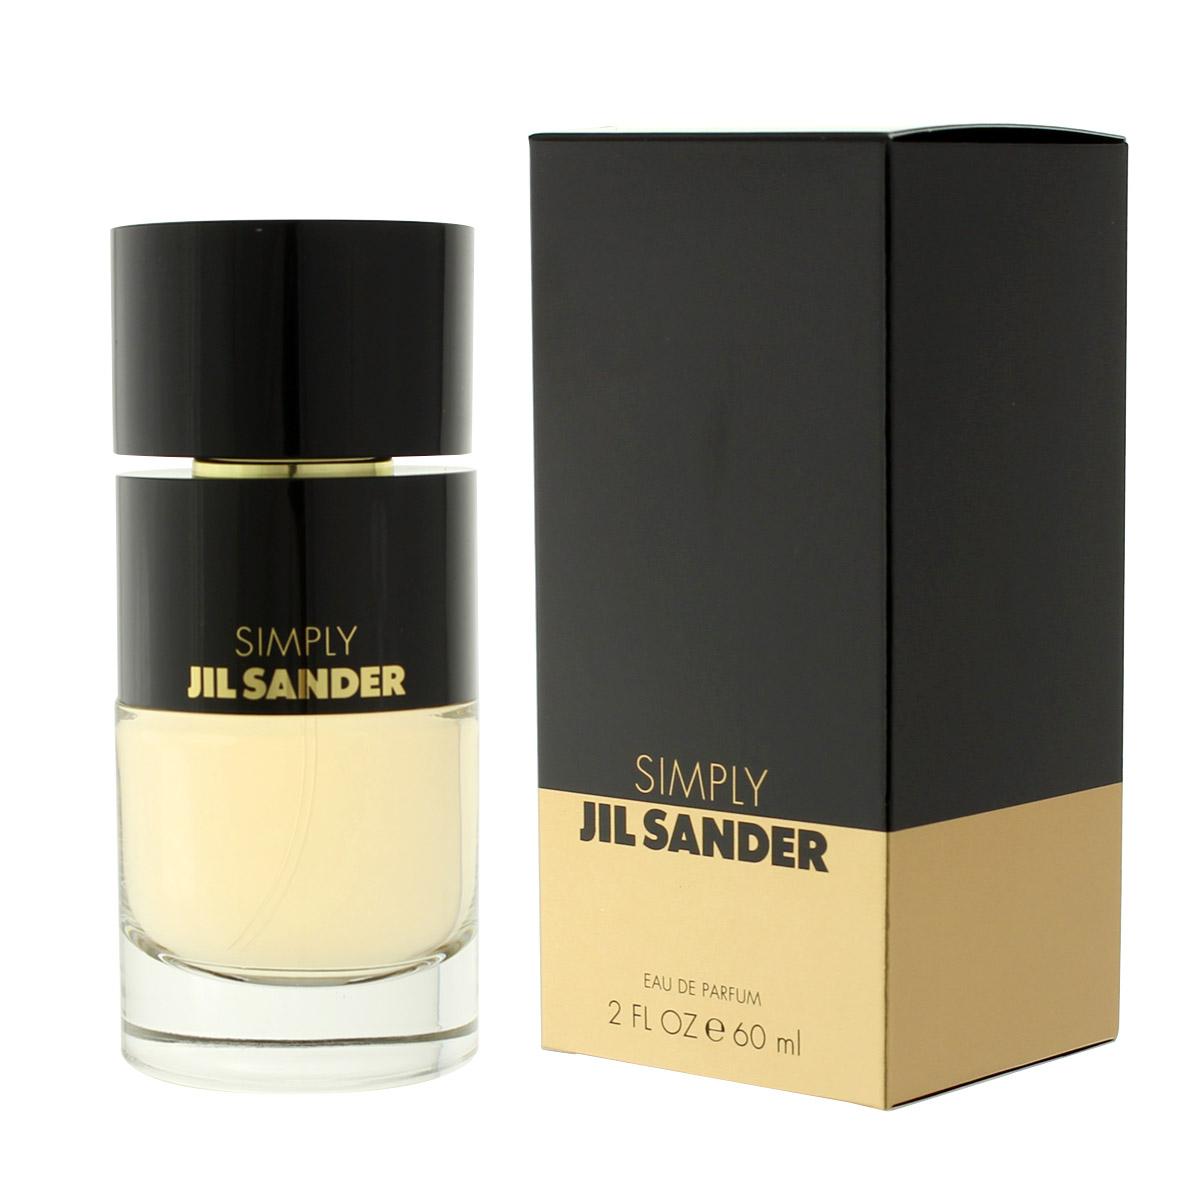 Jil Sander Simply Jil Sander Eau De Parfum 60 ml (woman)